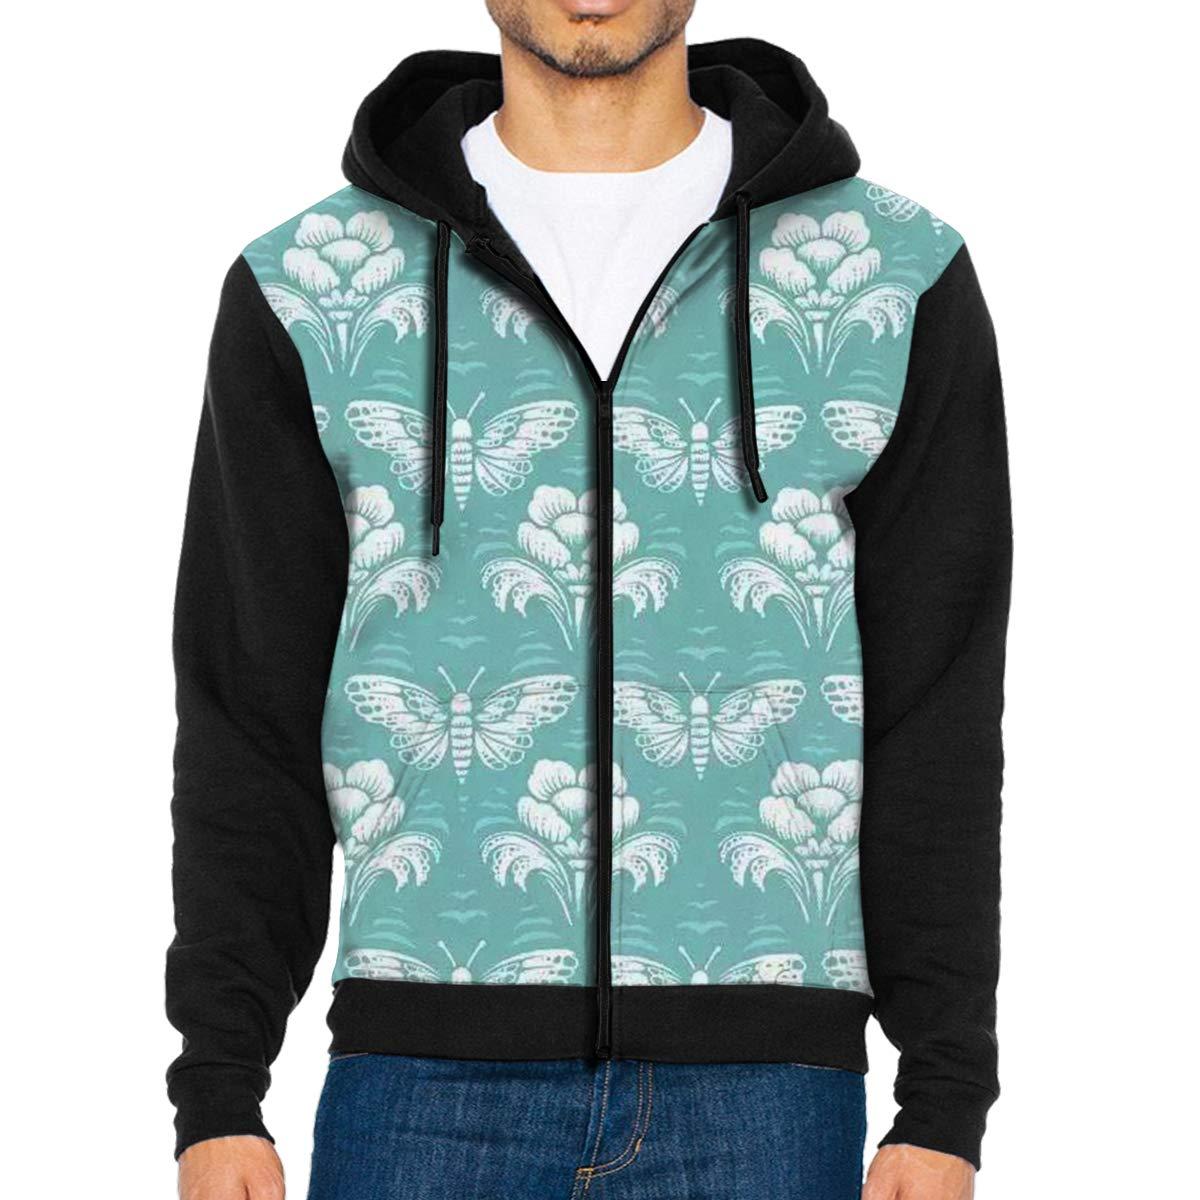 HEHE TAN Mens Pullover Hood Butterflies Flowers Zip Hoodies Hooded Fashion Jackets Coats